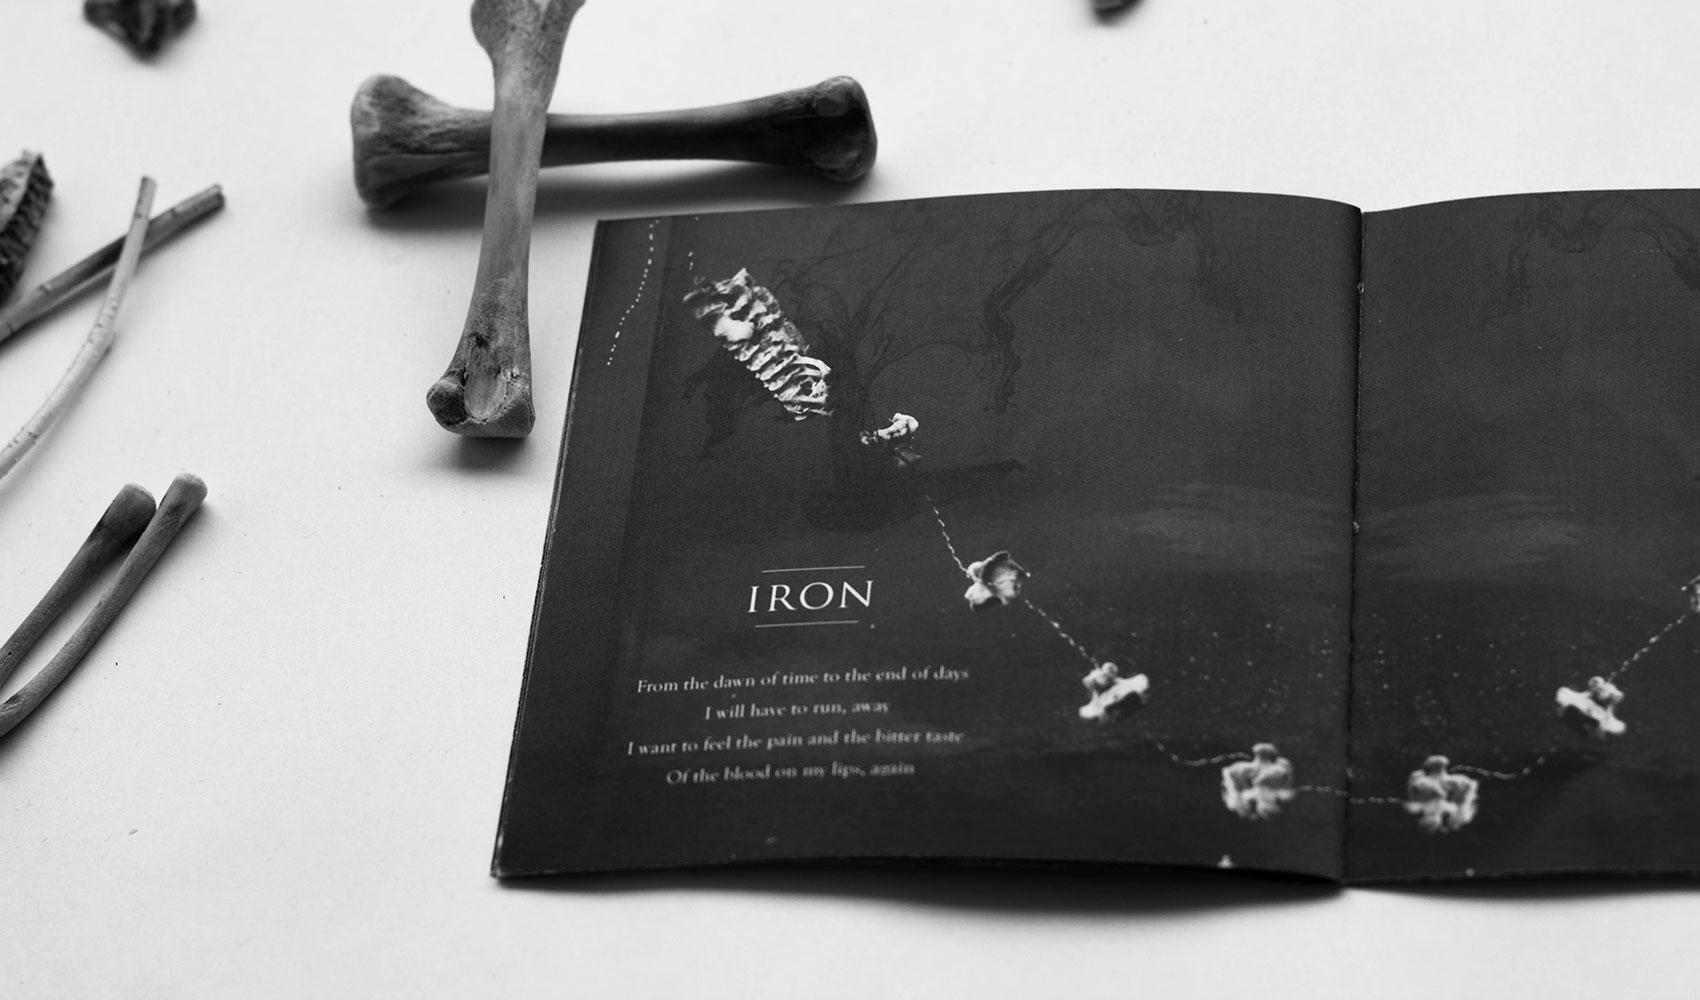 Woodkid Redesign Album - Personal Work: Booklet